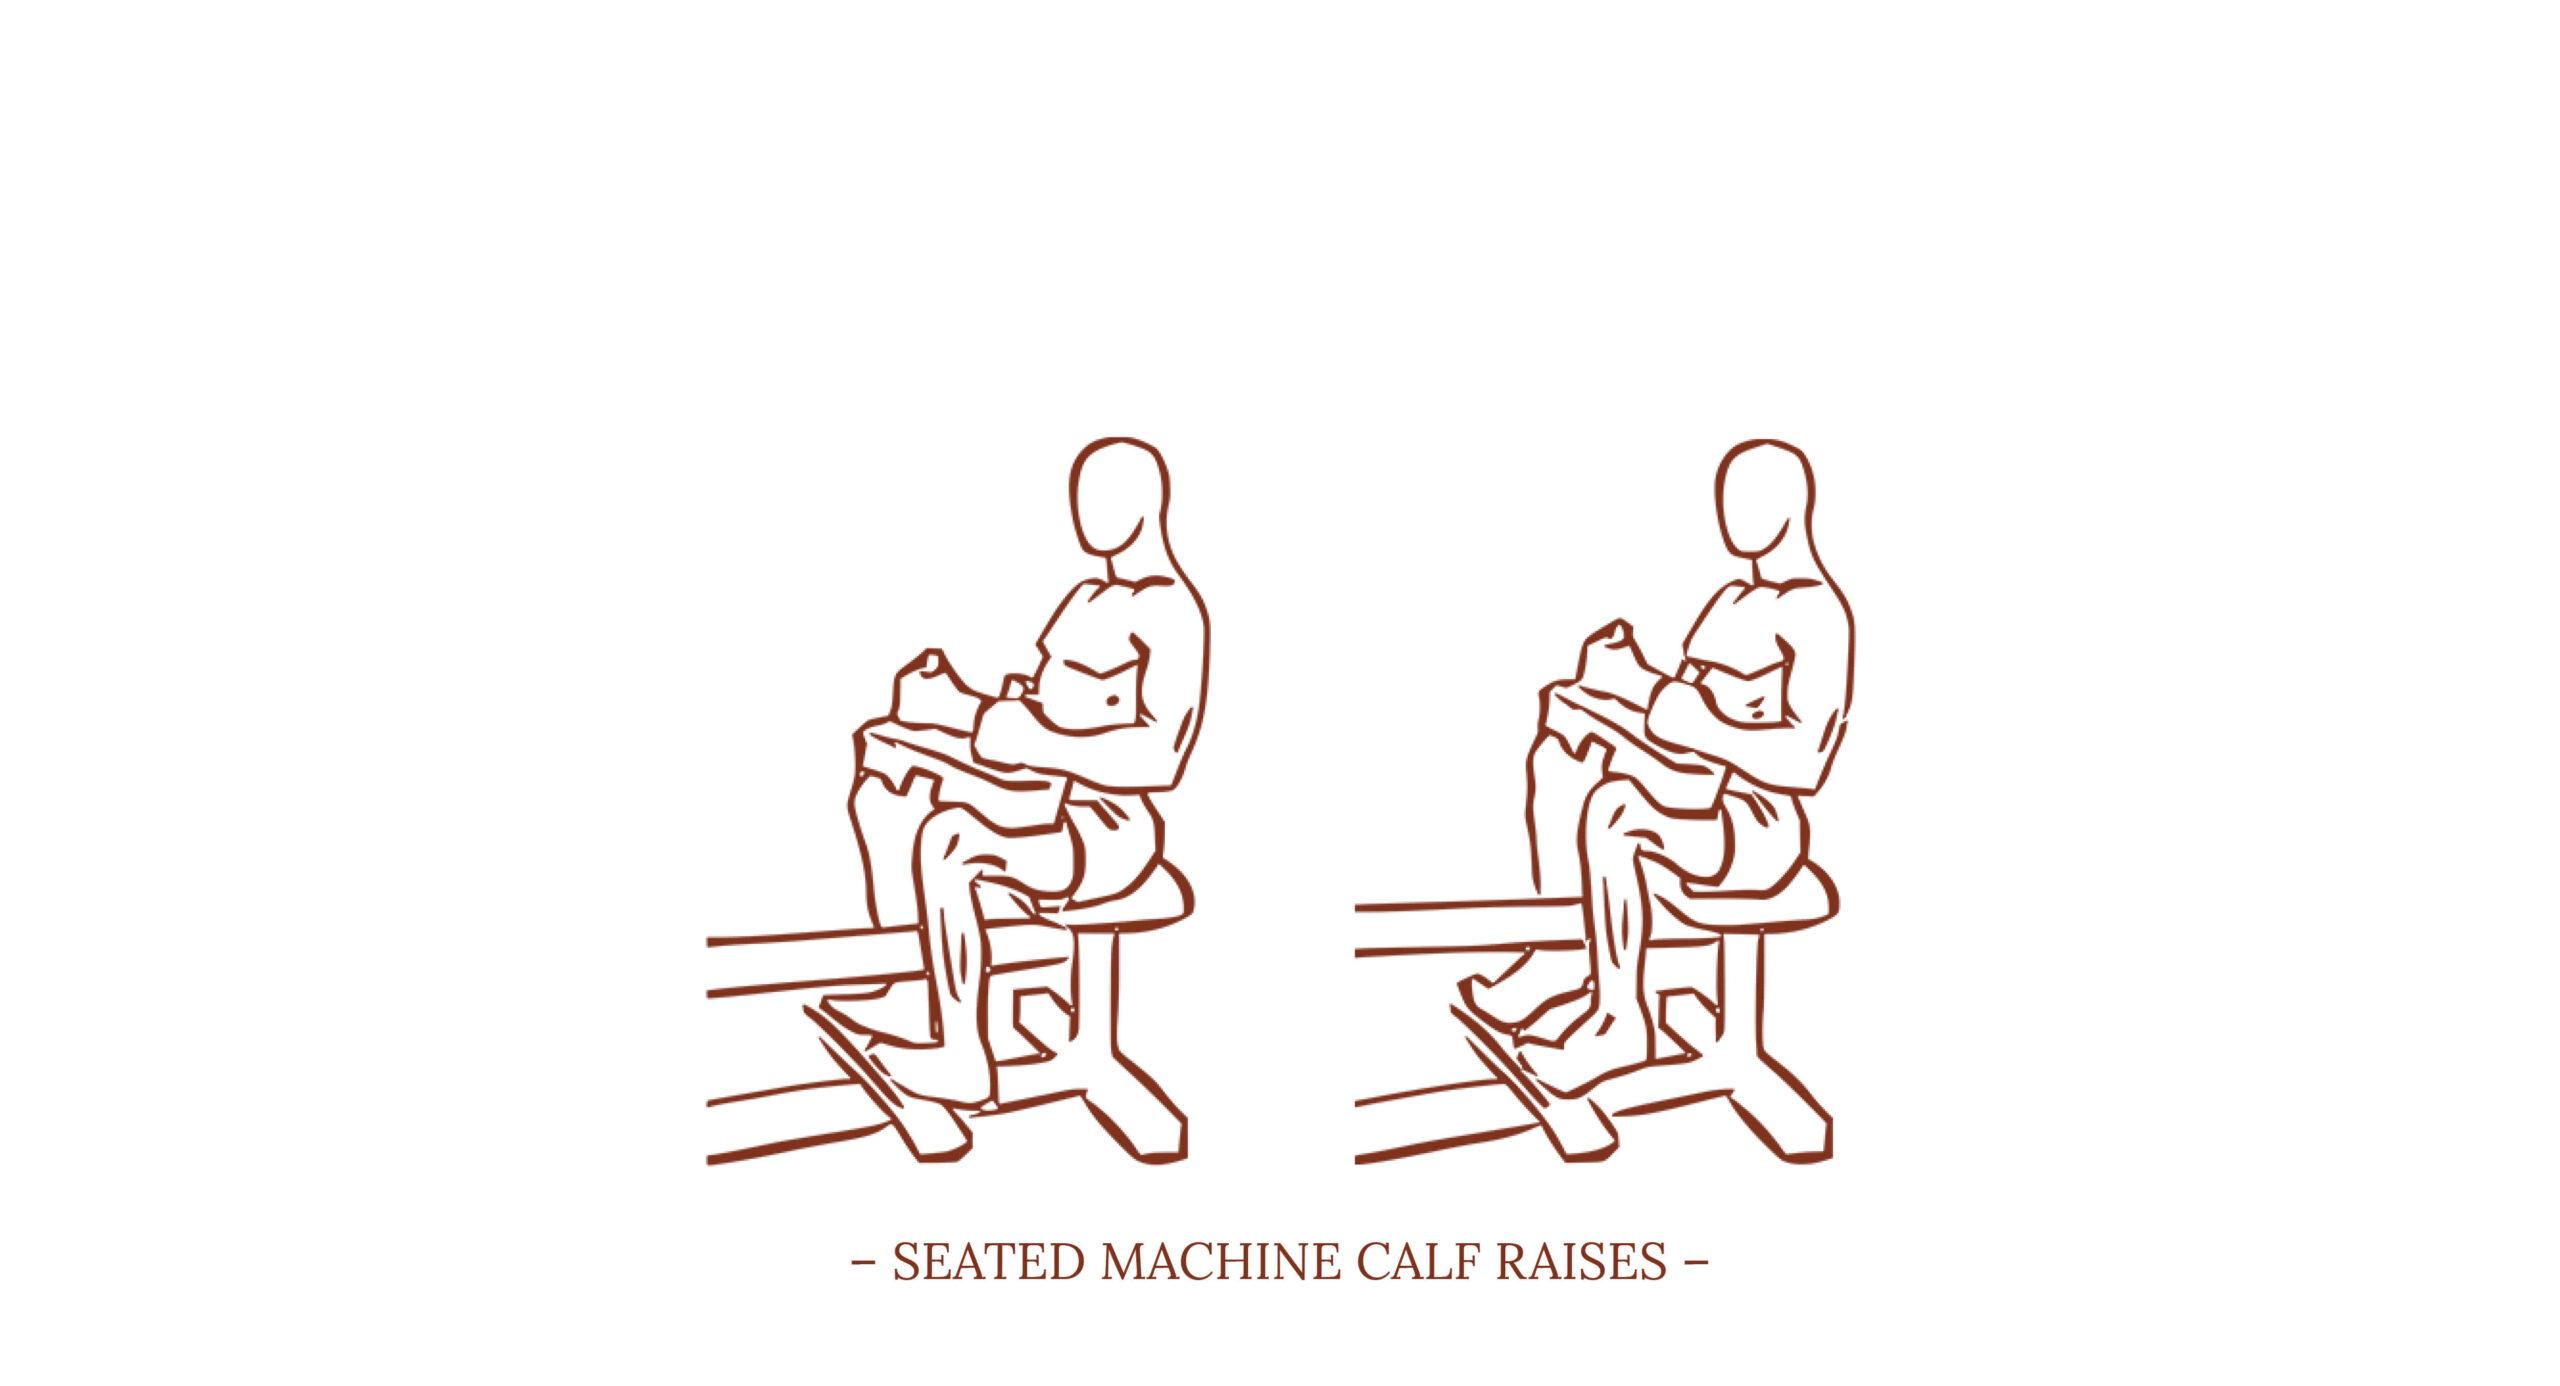 Seated Machine Calf Raises Illustration